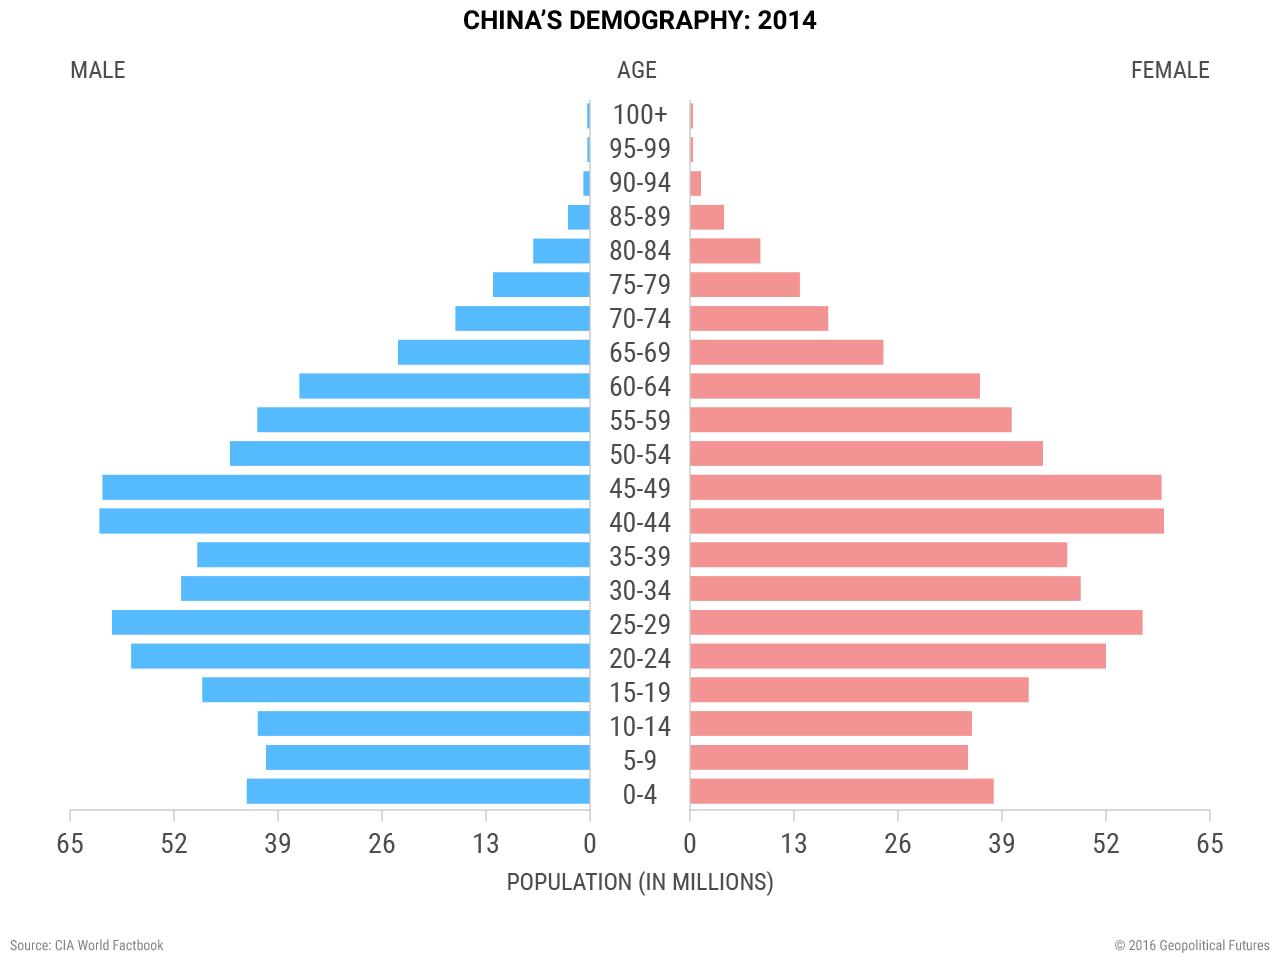 chinas-demography-2014